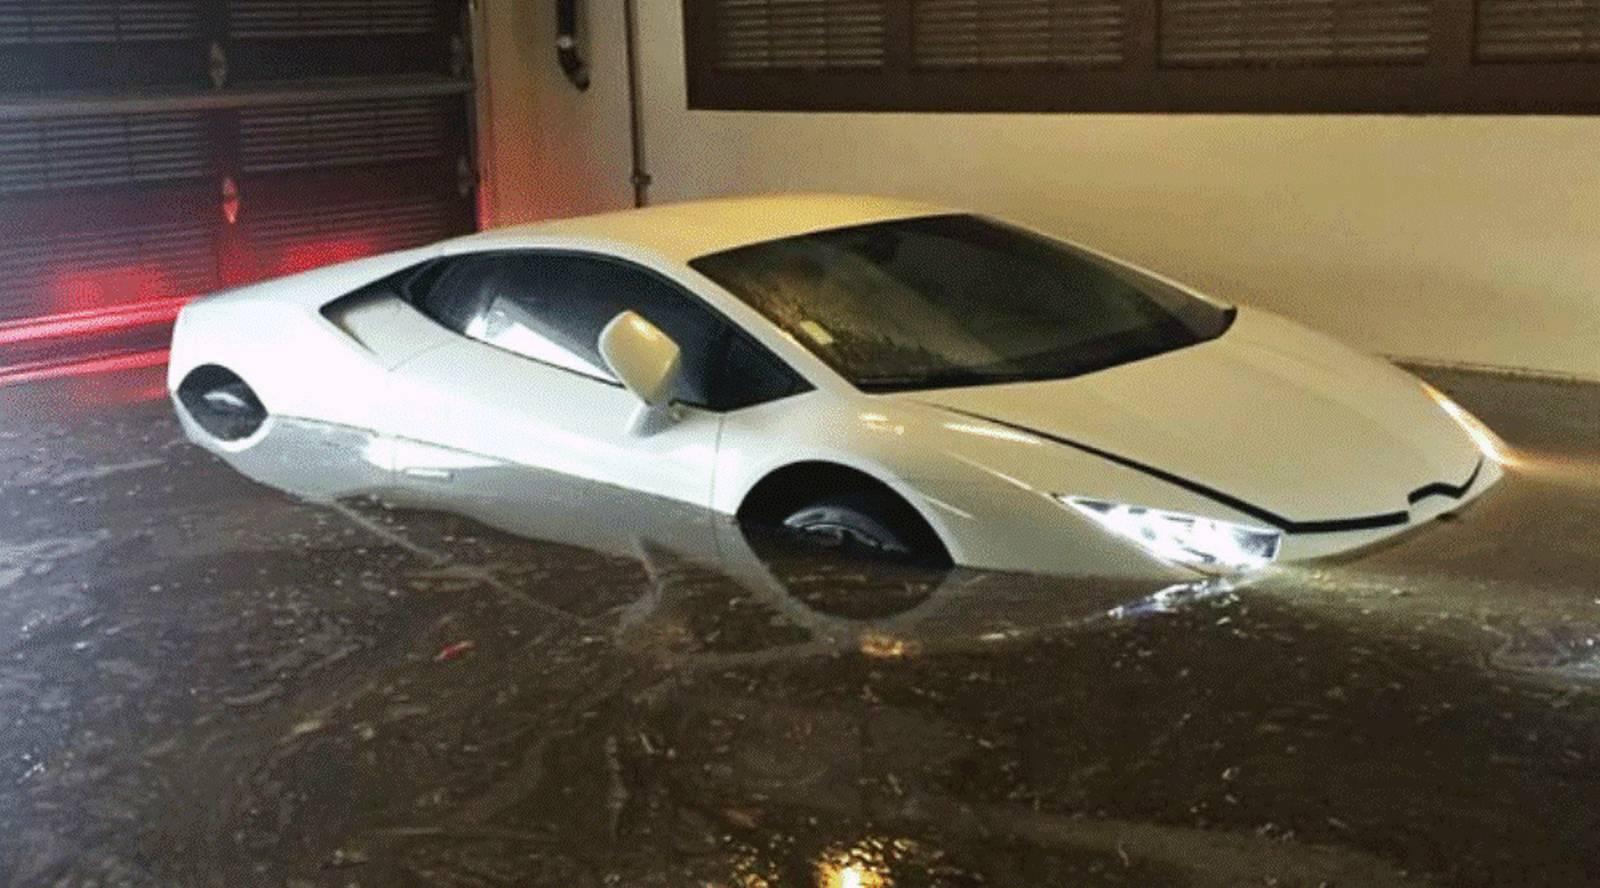 Car insurance in california cost 11